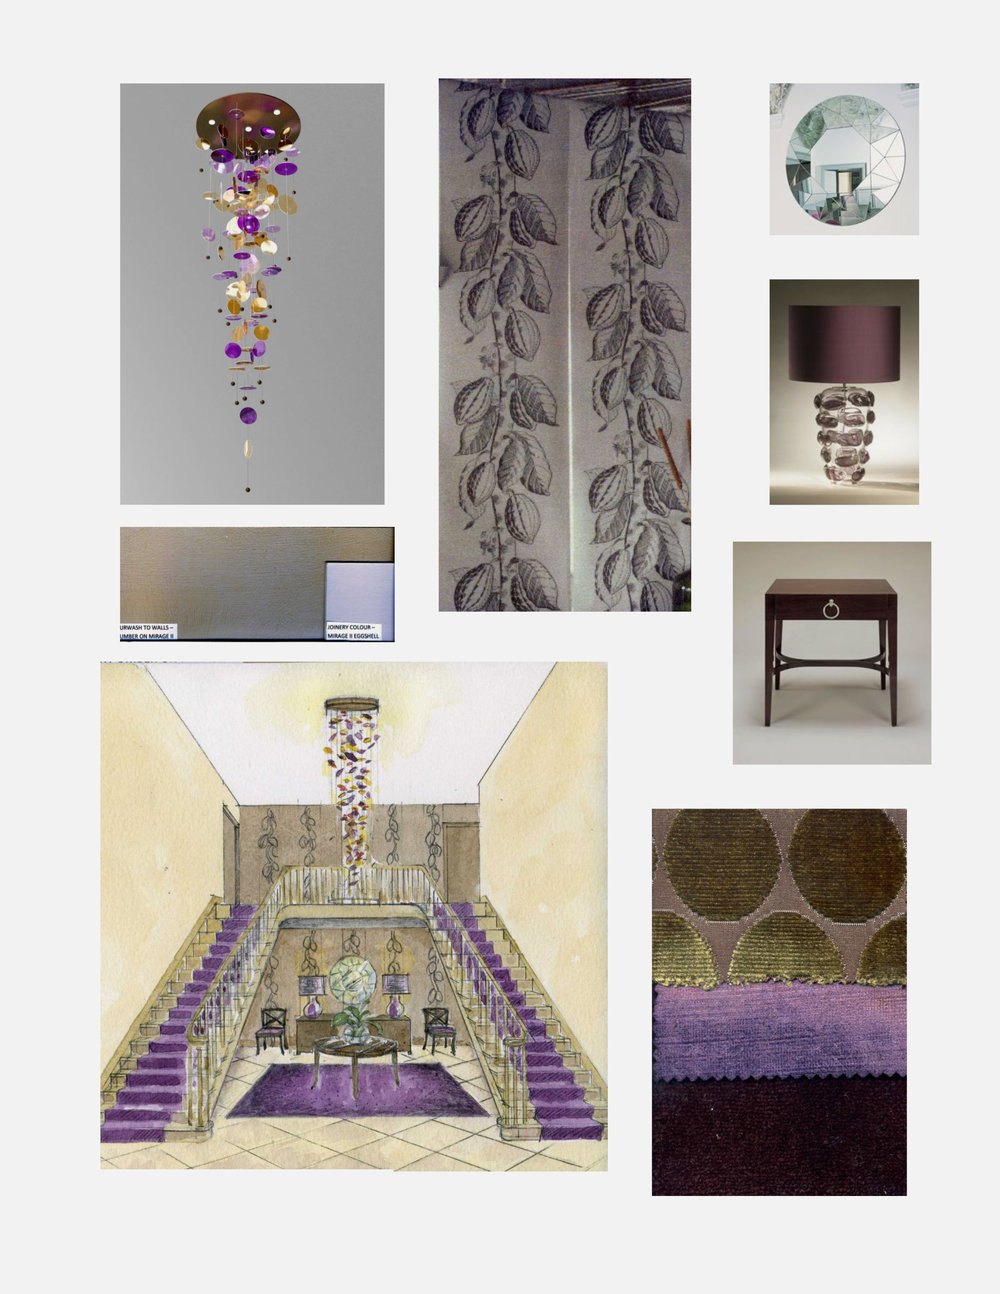 Hall-images.jpg